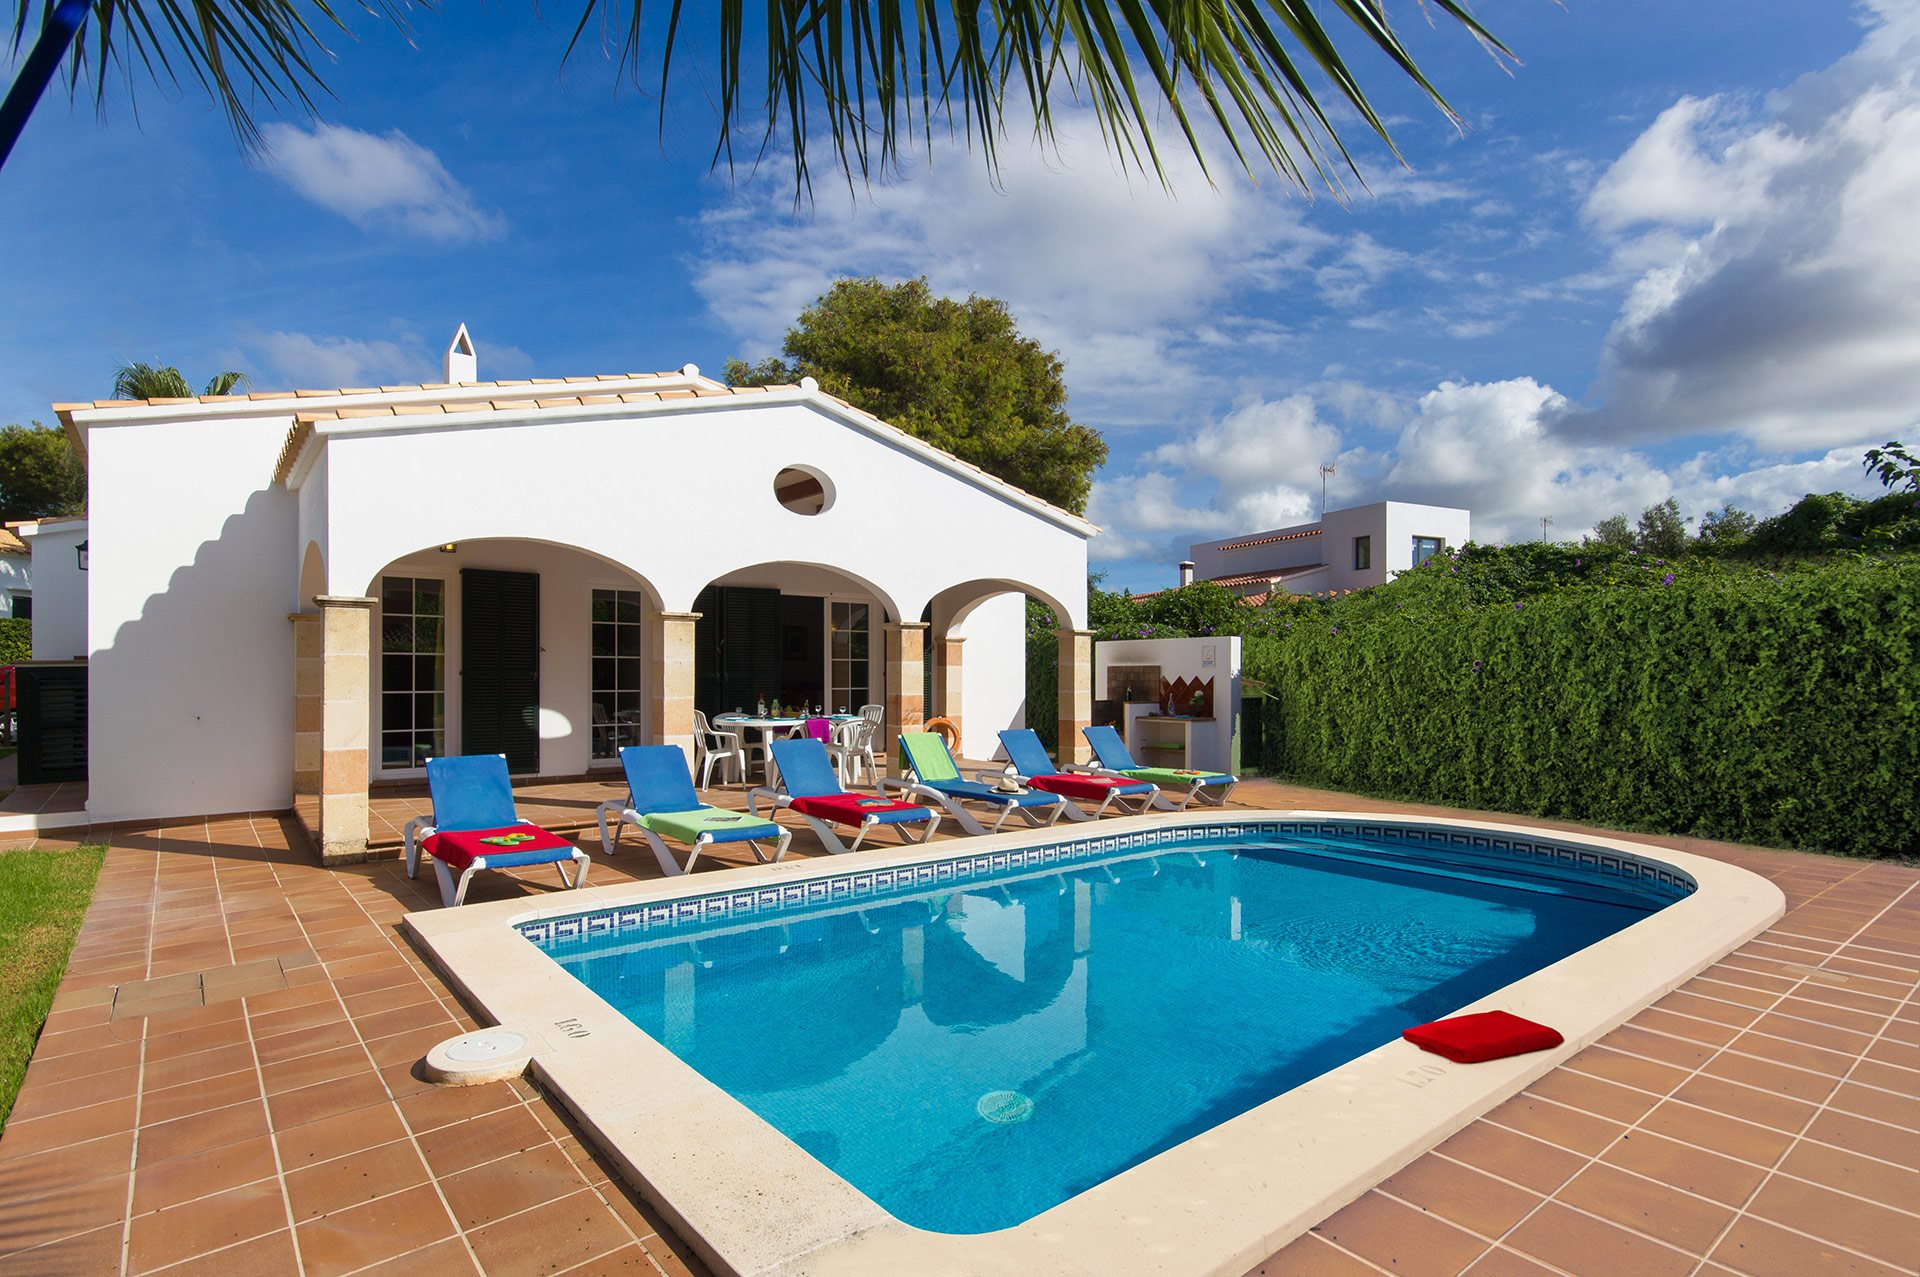 Villa Tord, Calan Blanes, Menorca, Spain